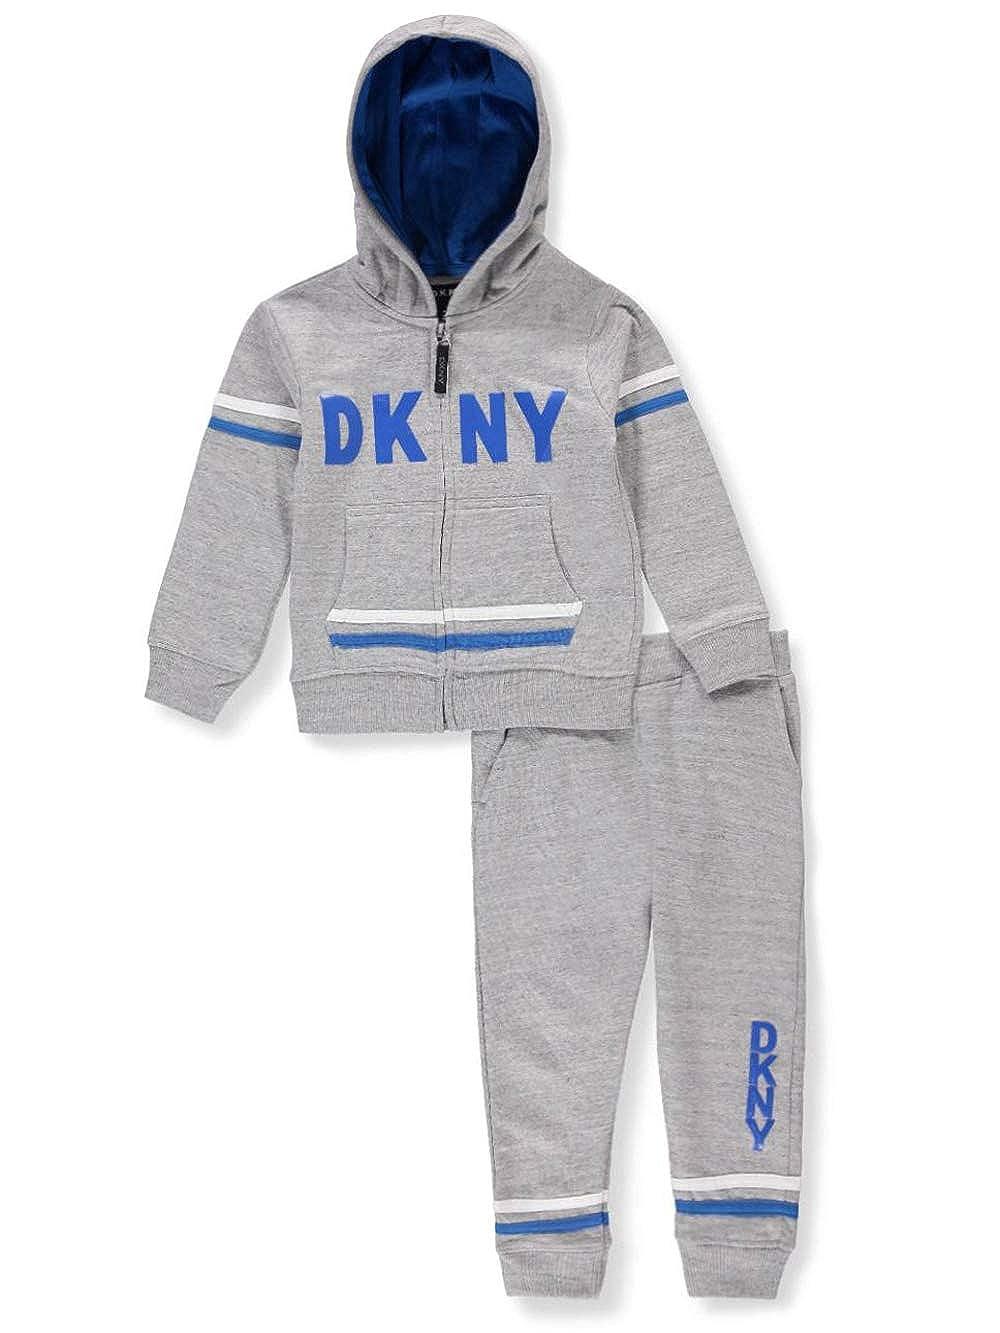 DKNY Boys' 2-Piece Sweatsuit Pants Set